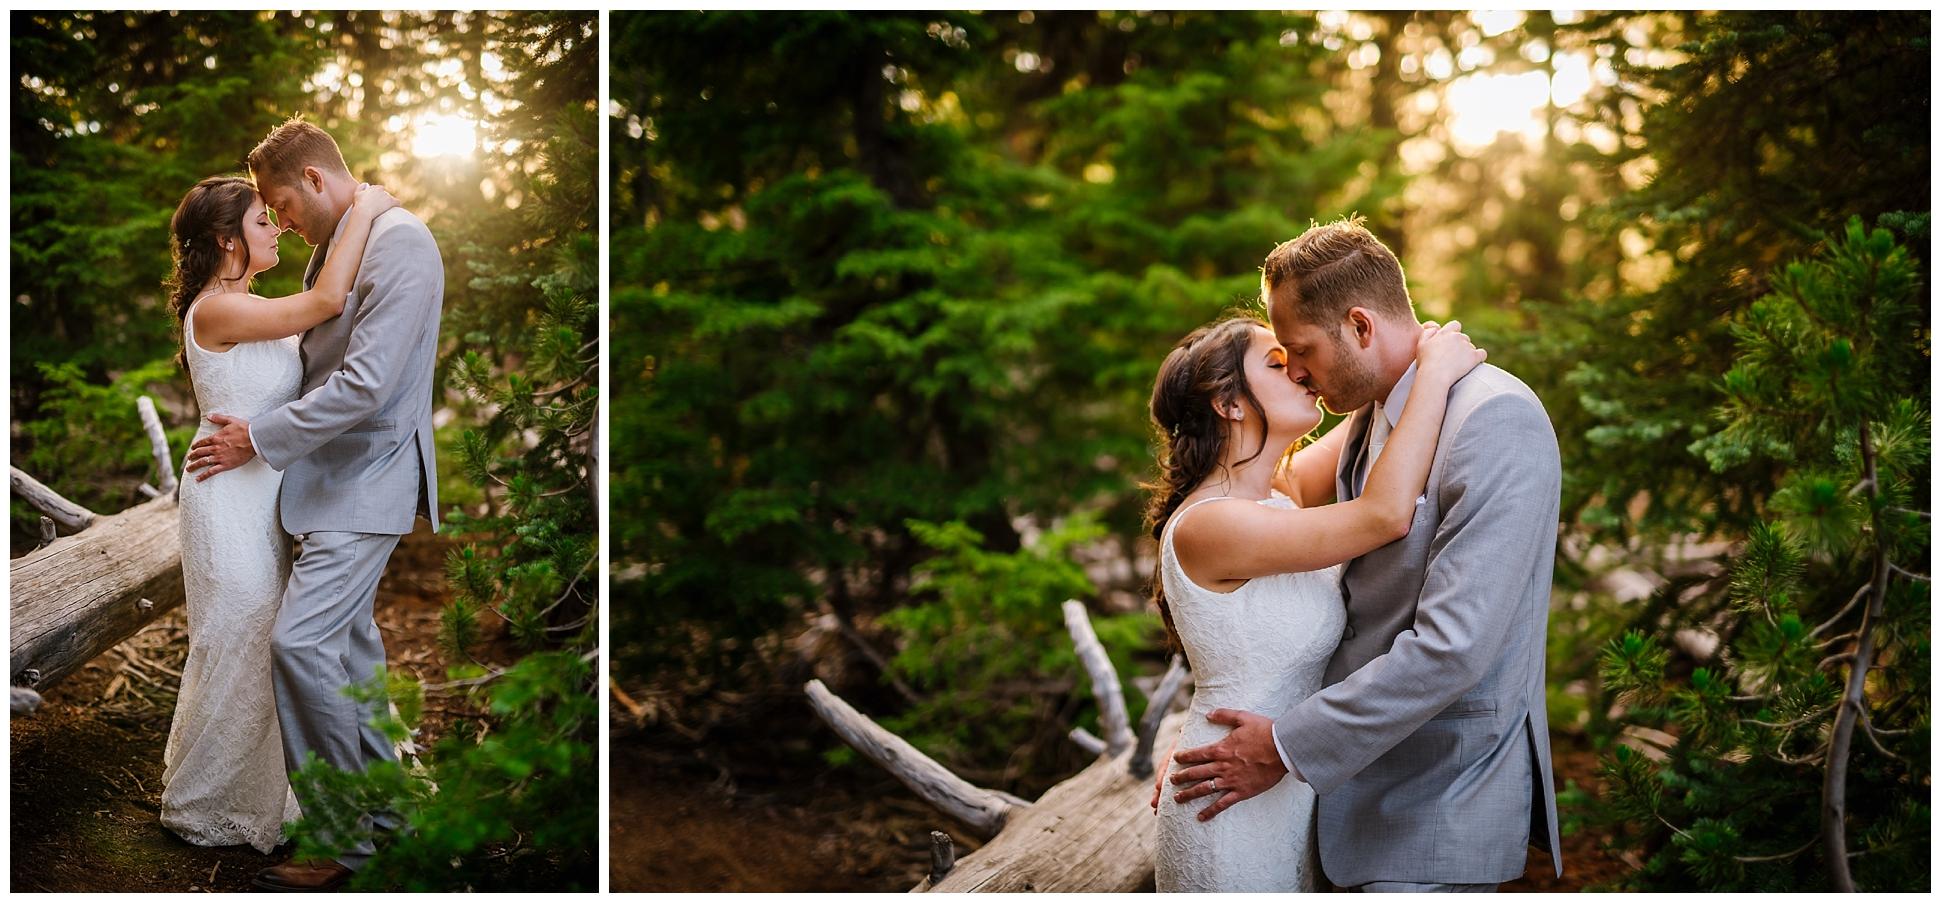 Ashlee-hamon-photography-year-in-review-2016-travel-wanderlust-vsco-adventure-wedding_0055.jpg